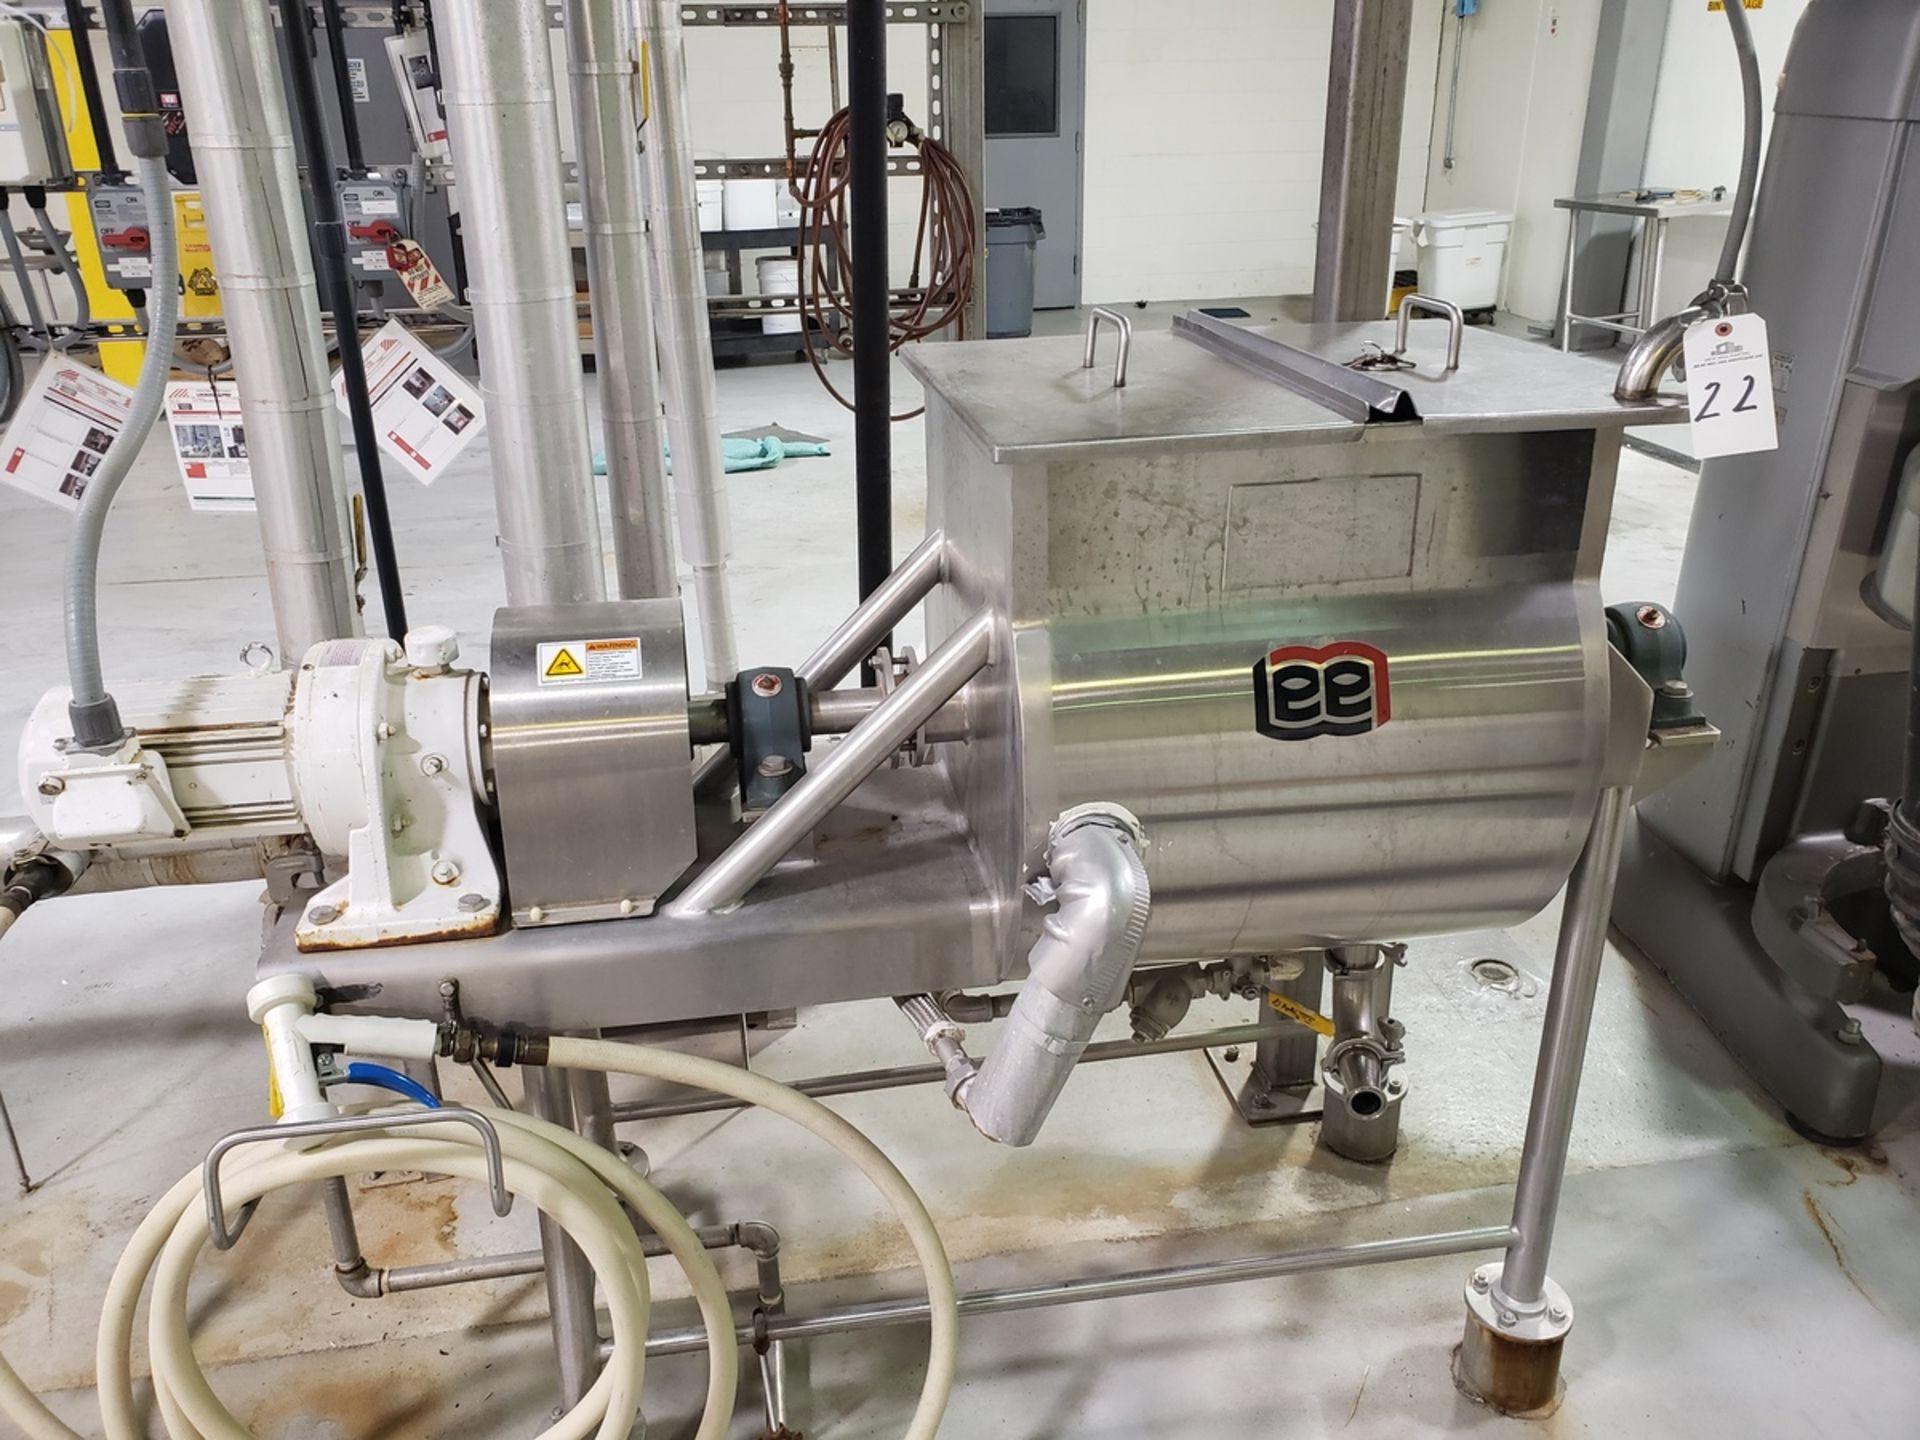 Lot 22 - Ribbon Blender - Lee Industries 25 Gallon Scraped Surfaced, Jacketed Ribb - Loc: NJ   Rig Fee: $100